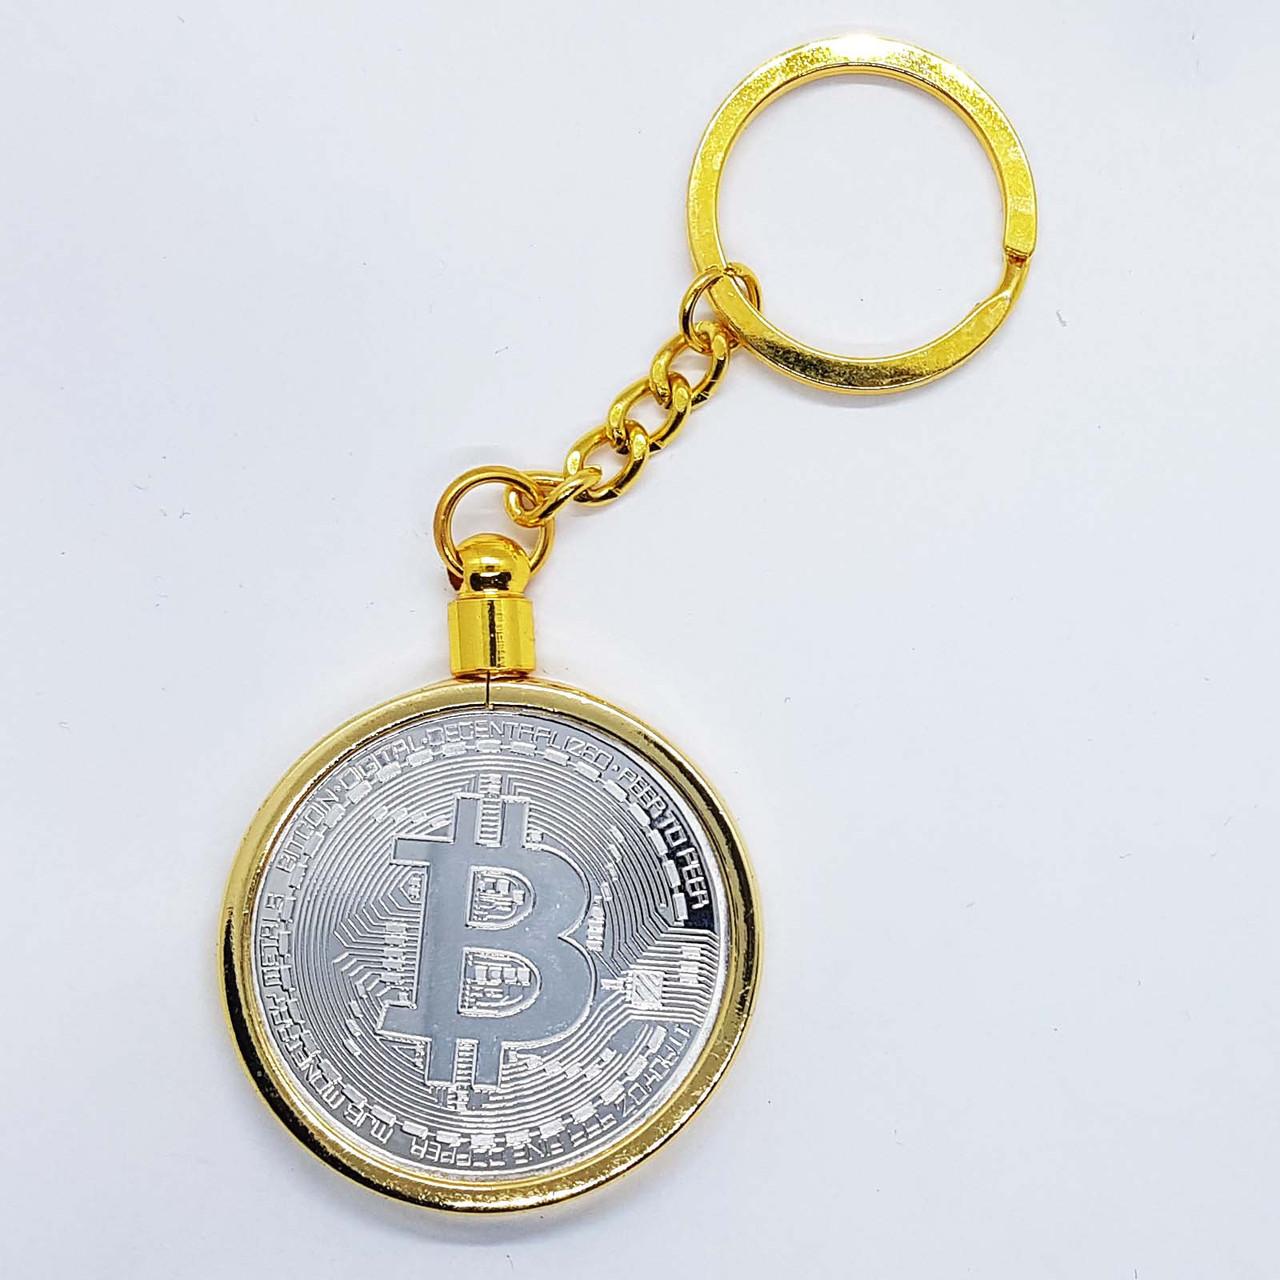 Брелок на ключи в виде монеты Bitcoin серебряная